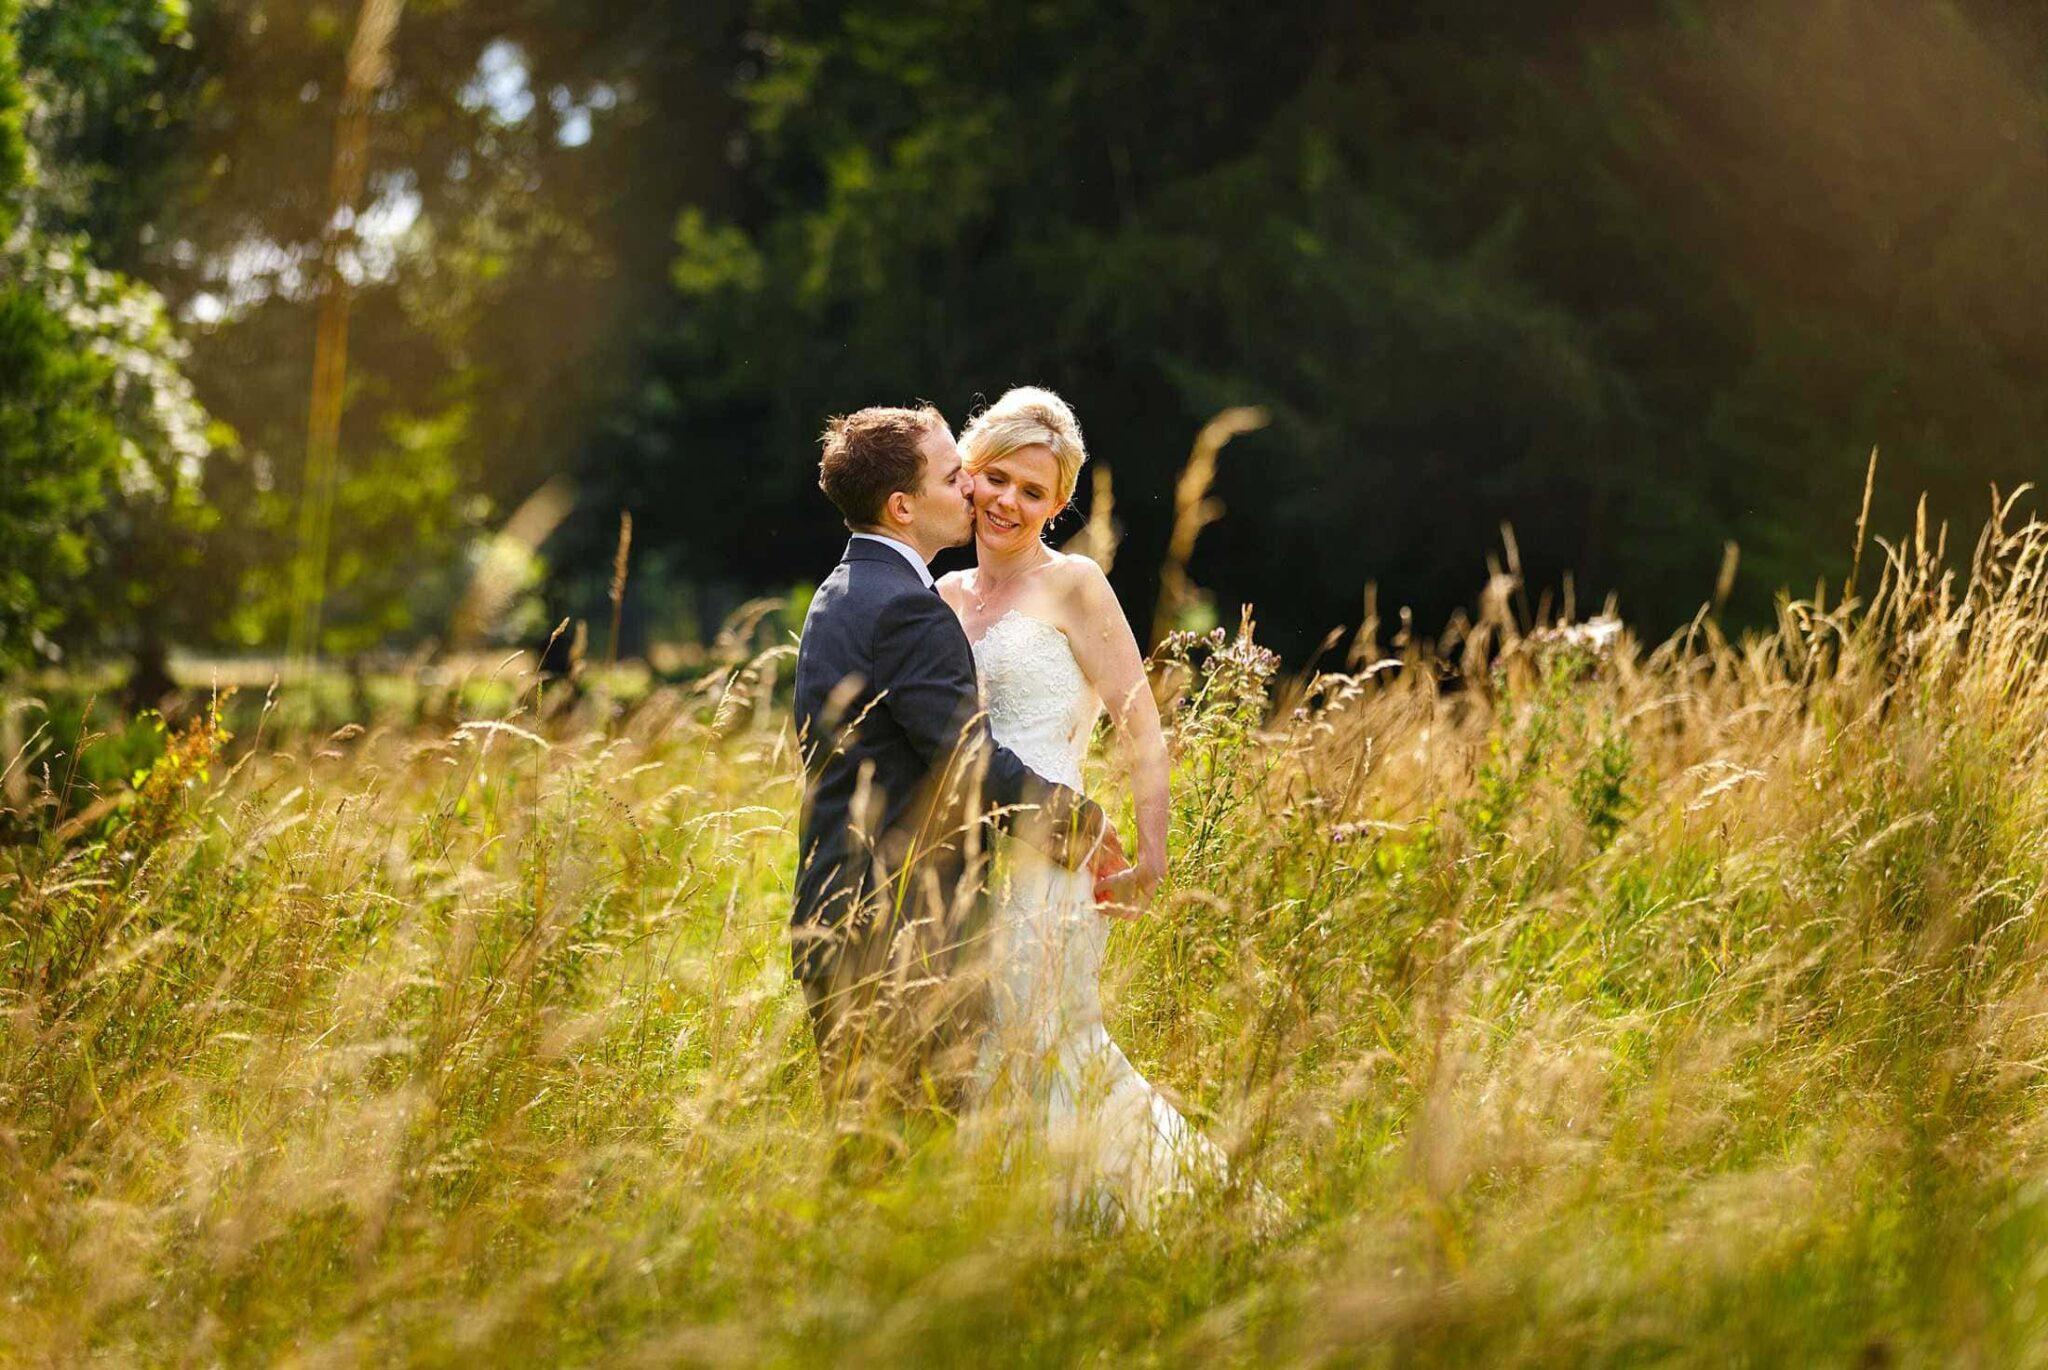 Hengrave wedding photographer | Louise & Alex